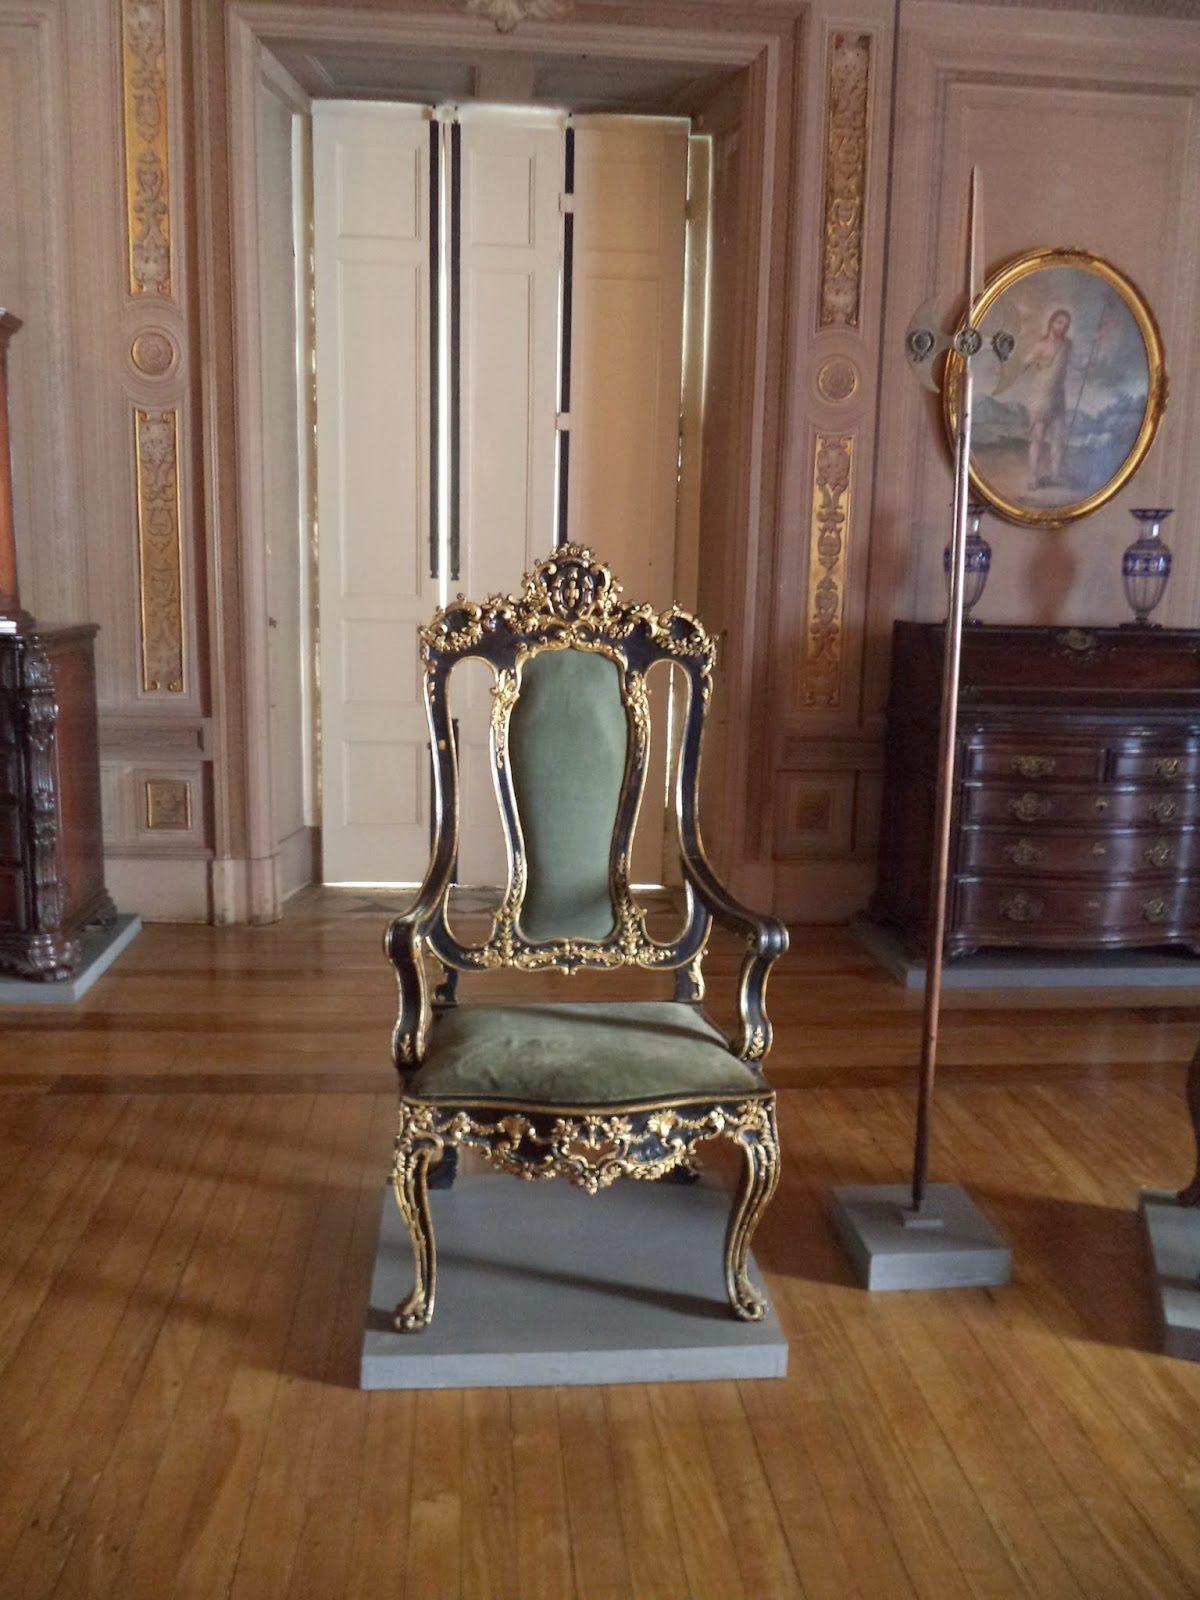 Imperial Senate s Throne of Pedro II of Brazil